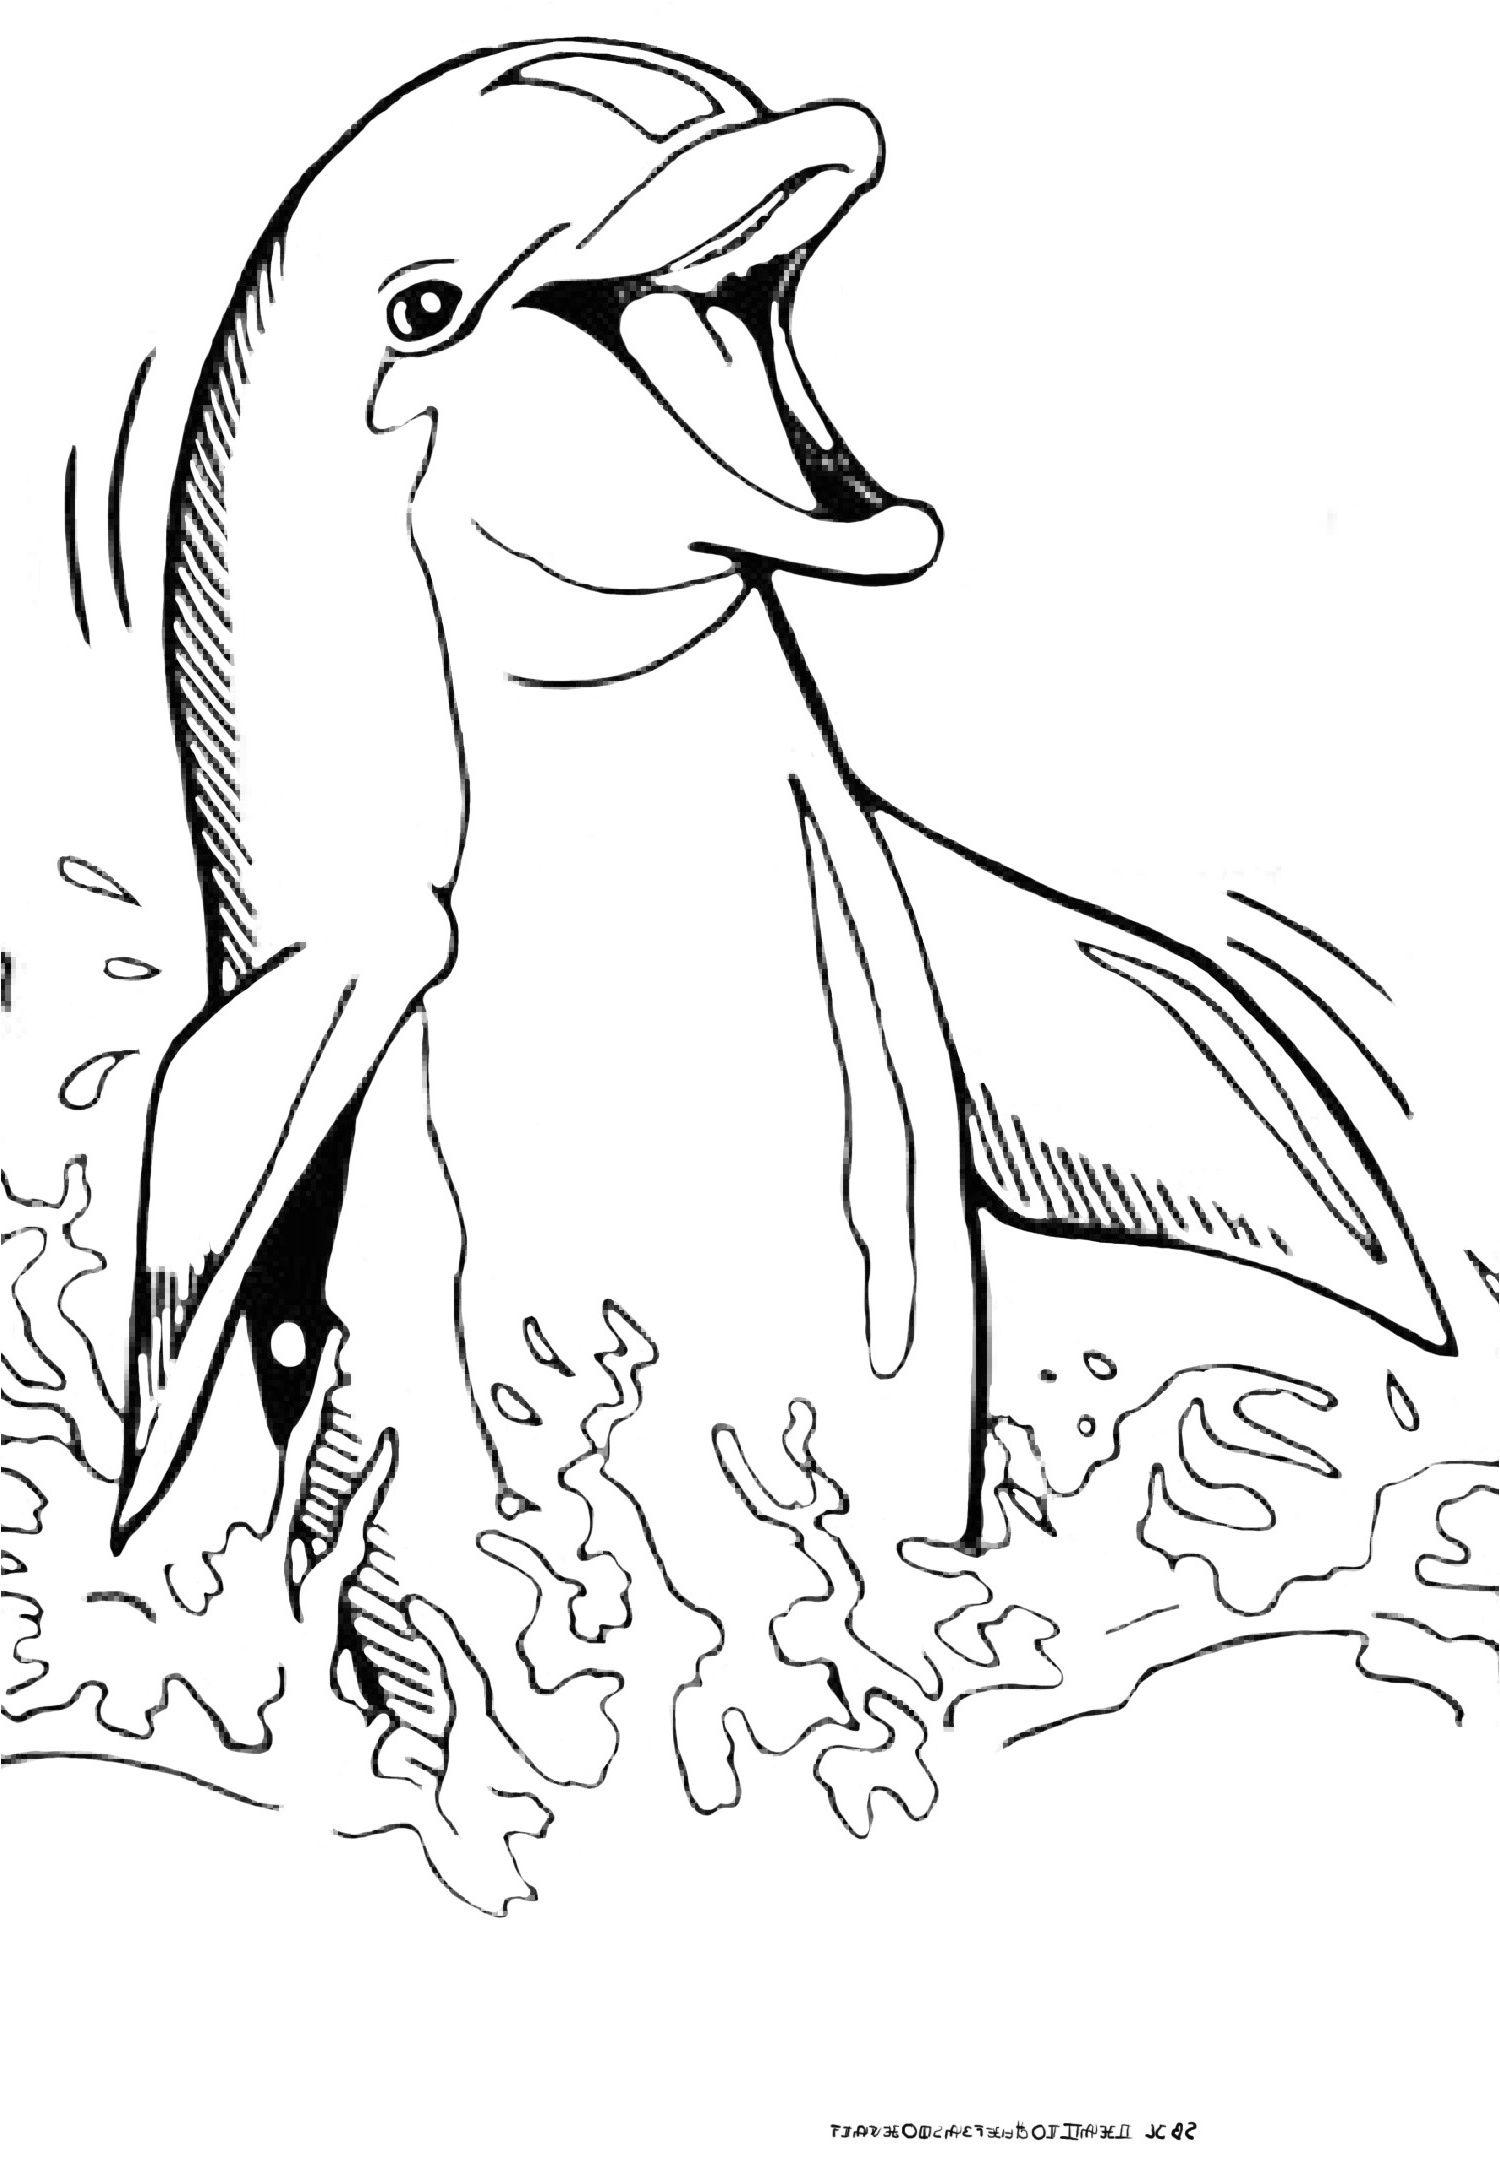 Dessin A Colorier Sirene Et Dauphin Coloriagedauphin Coloriage